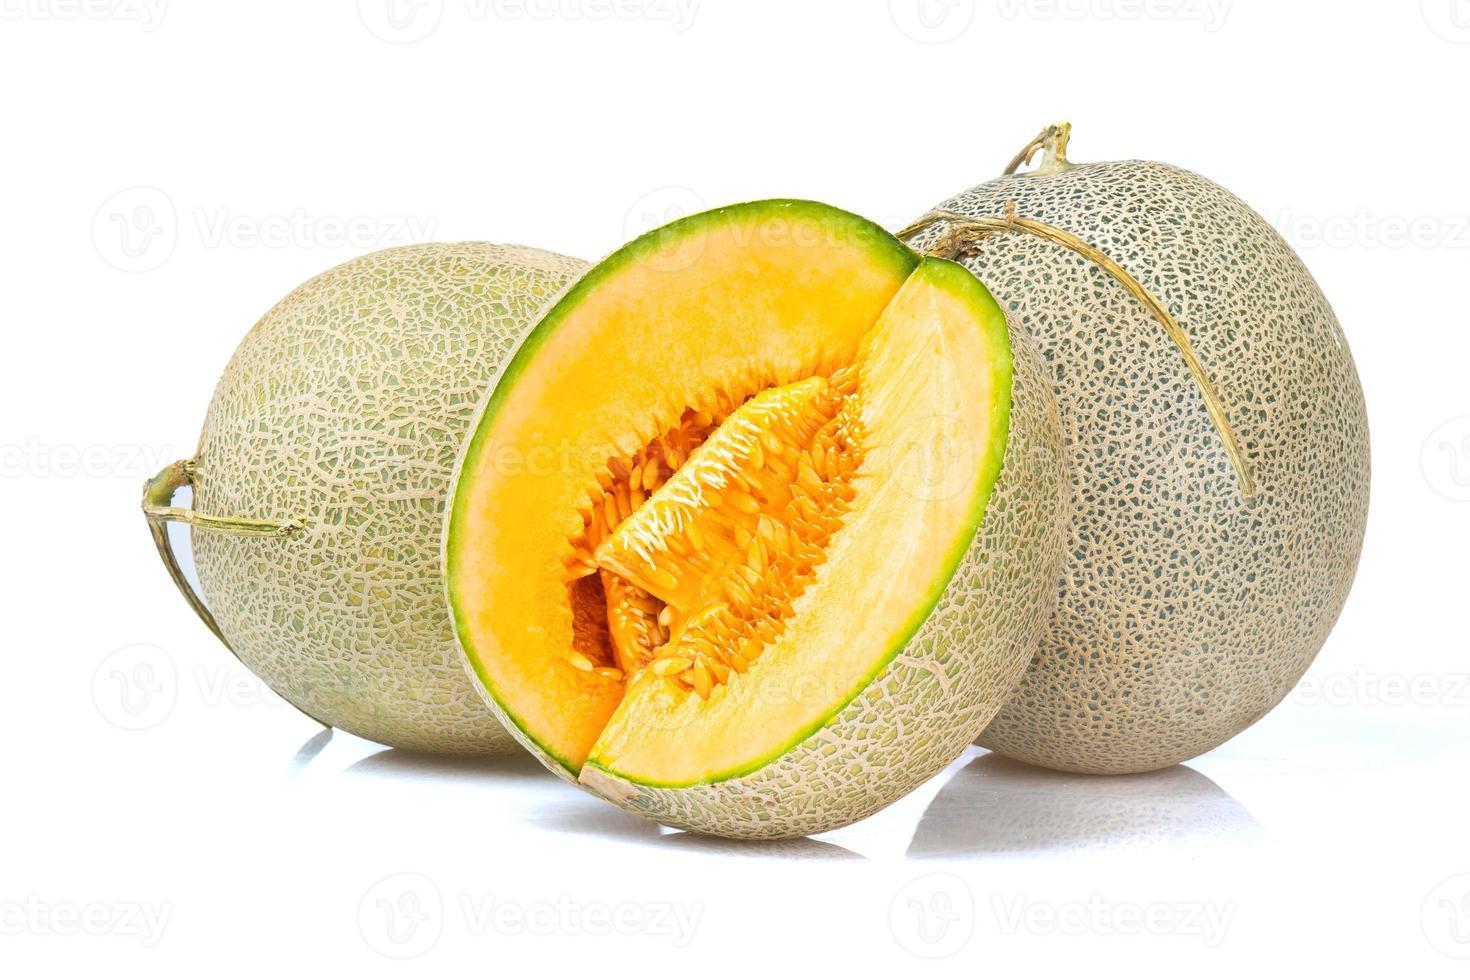 Melon cantalope isolé sur fond blanc photo